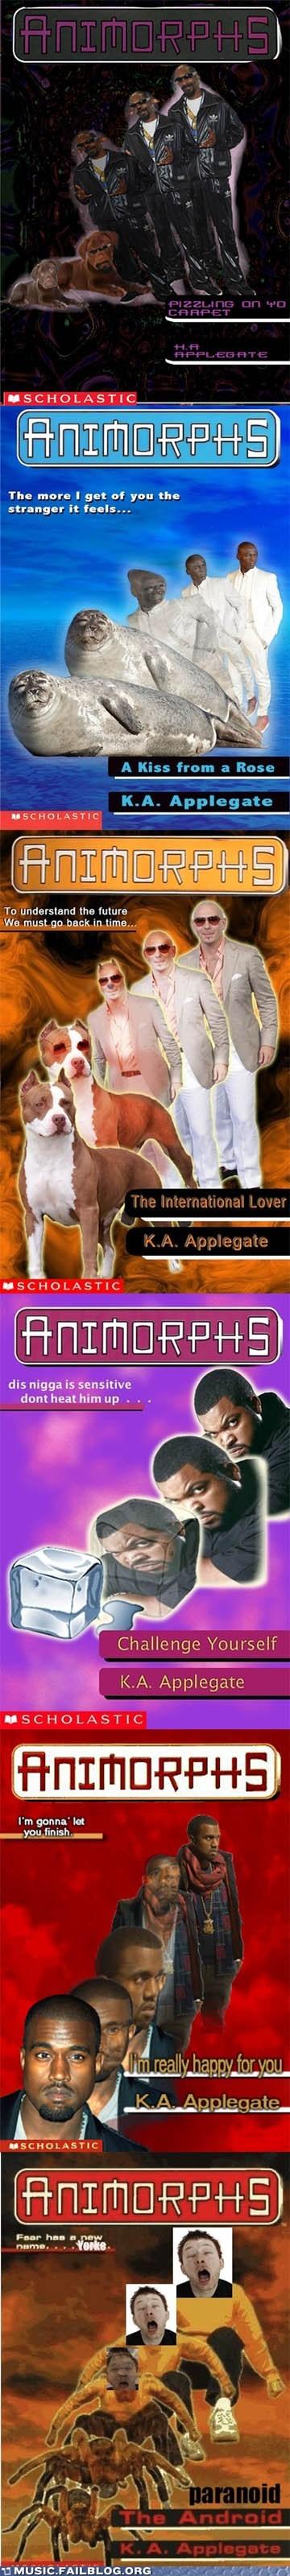 animorphs ice cube kanye west pitbull radiohead seal snoop dogg Thom Yorke - 6438029568